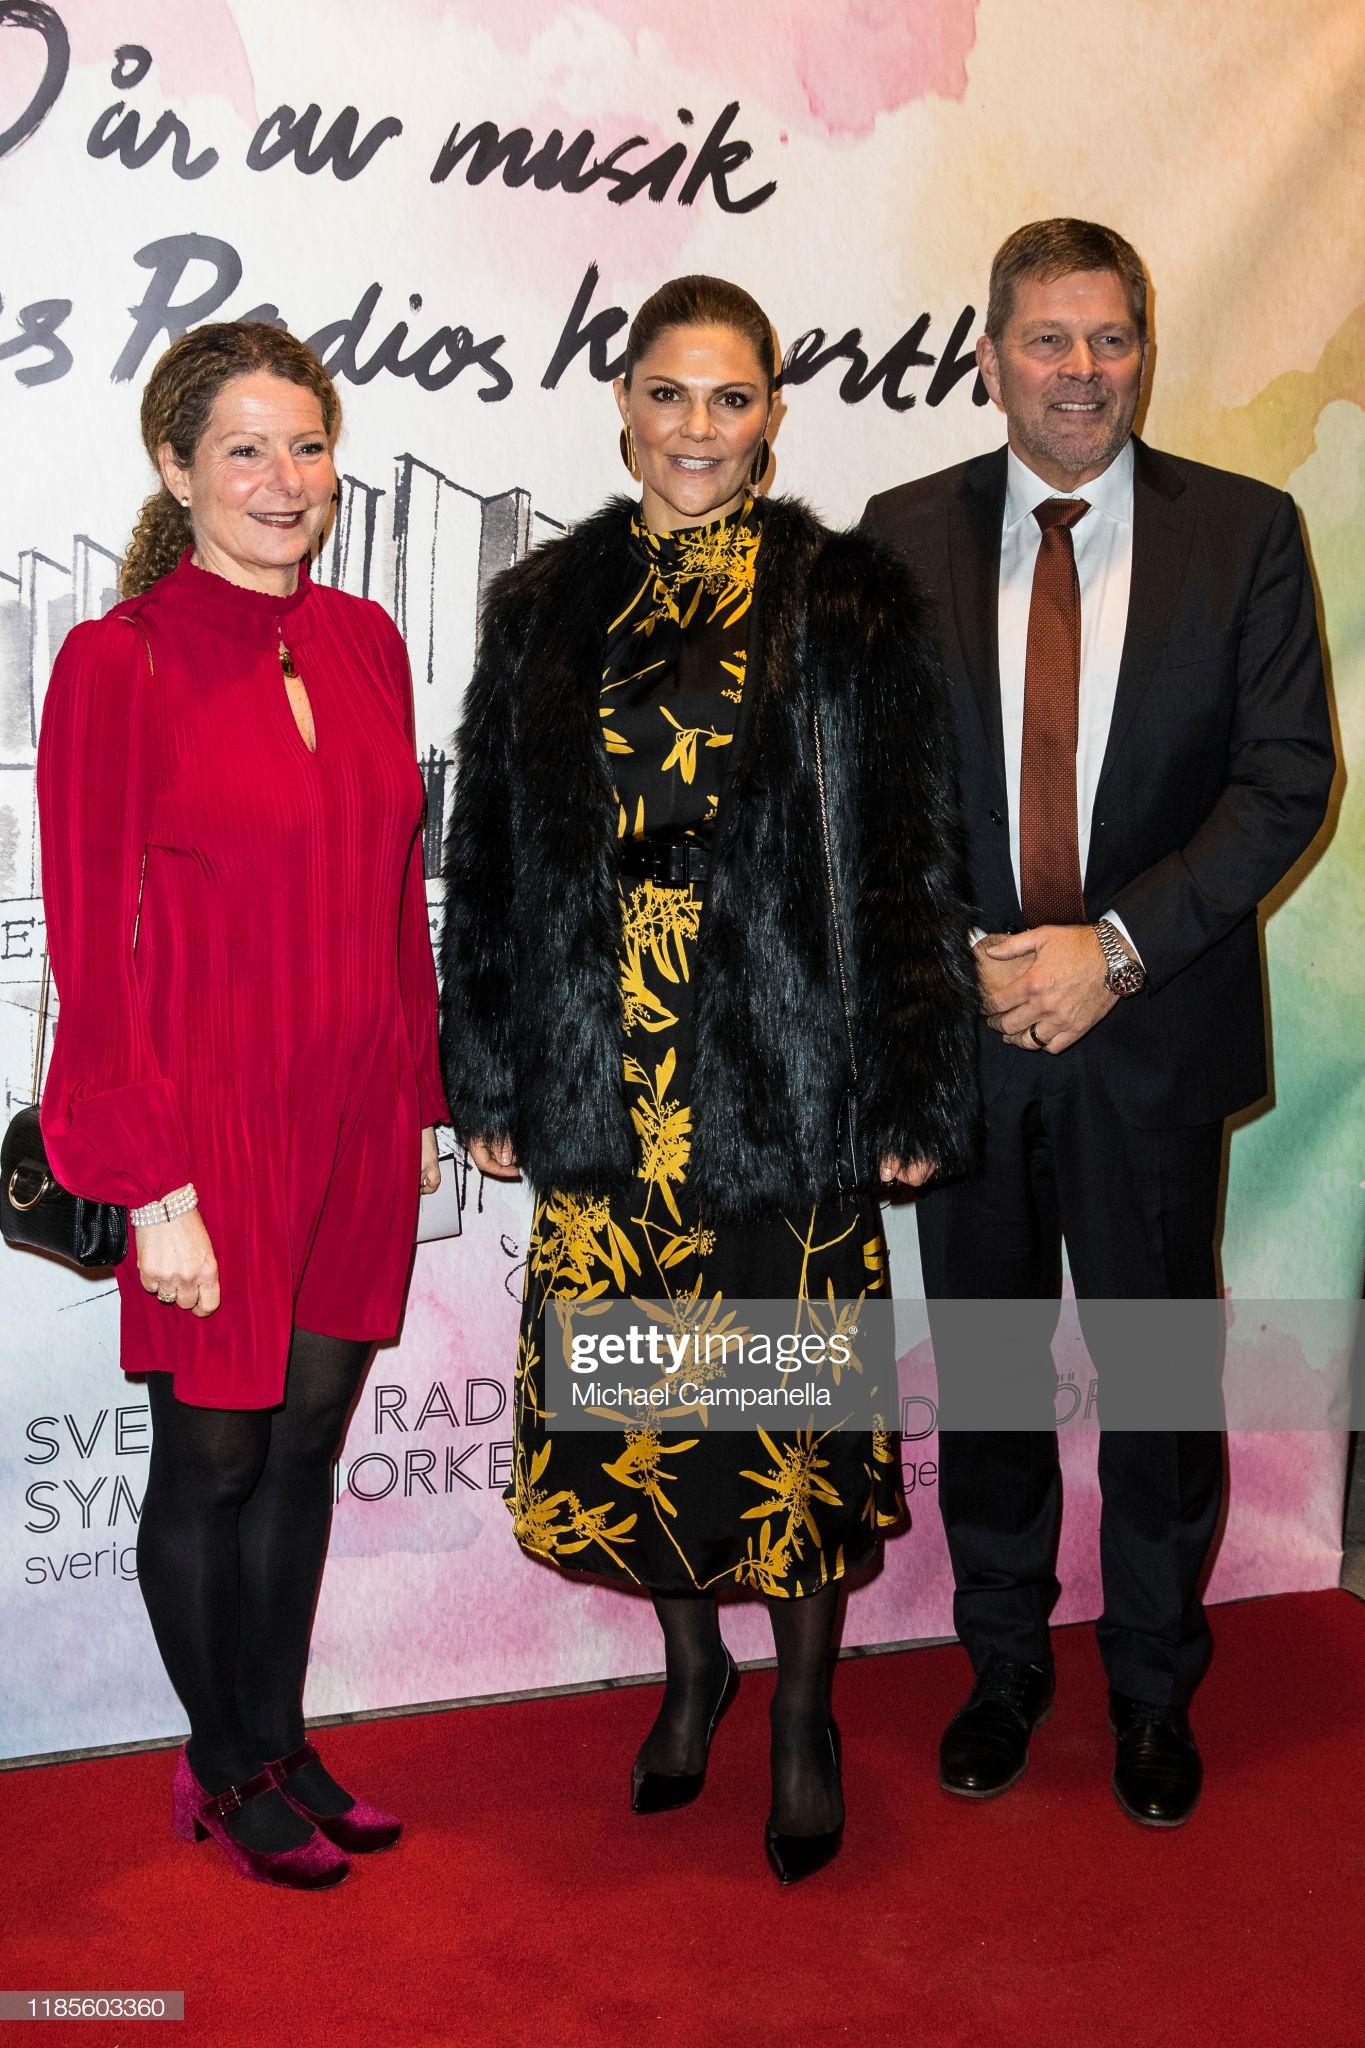 STOCKHOLM, SWEDEN - NOVEMBER 30: Crown Princess Victoria of Sweden (center) arrives at Berwaldhallen to attend a concert in celebration of Berwaldhallens 40th anniversary on November 30, 2019 in Stockholm, Sweden. (Photo by Michael Campanella/Getty Images)